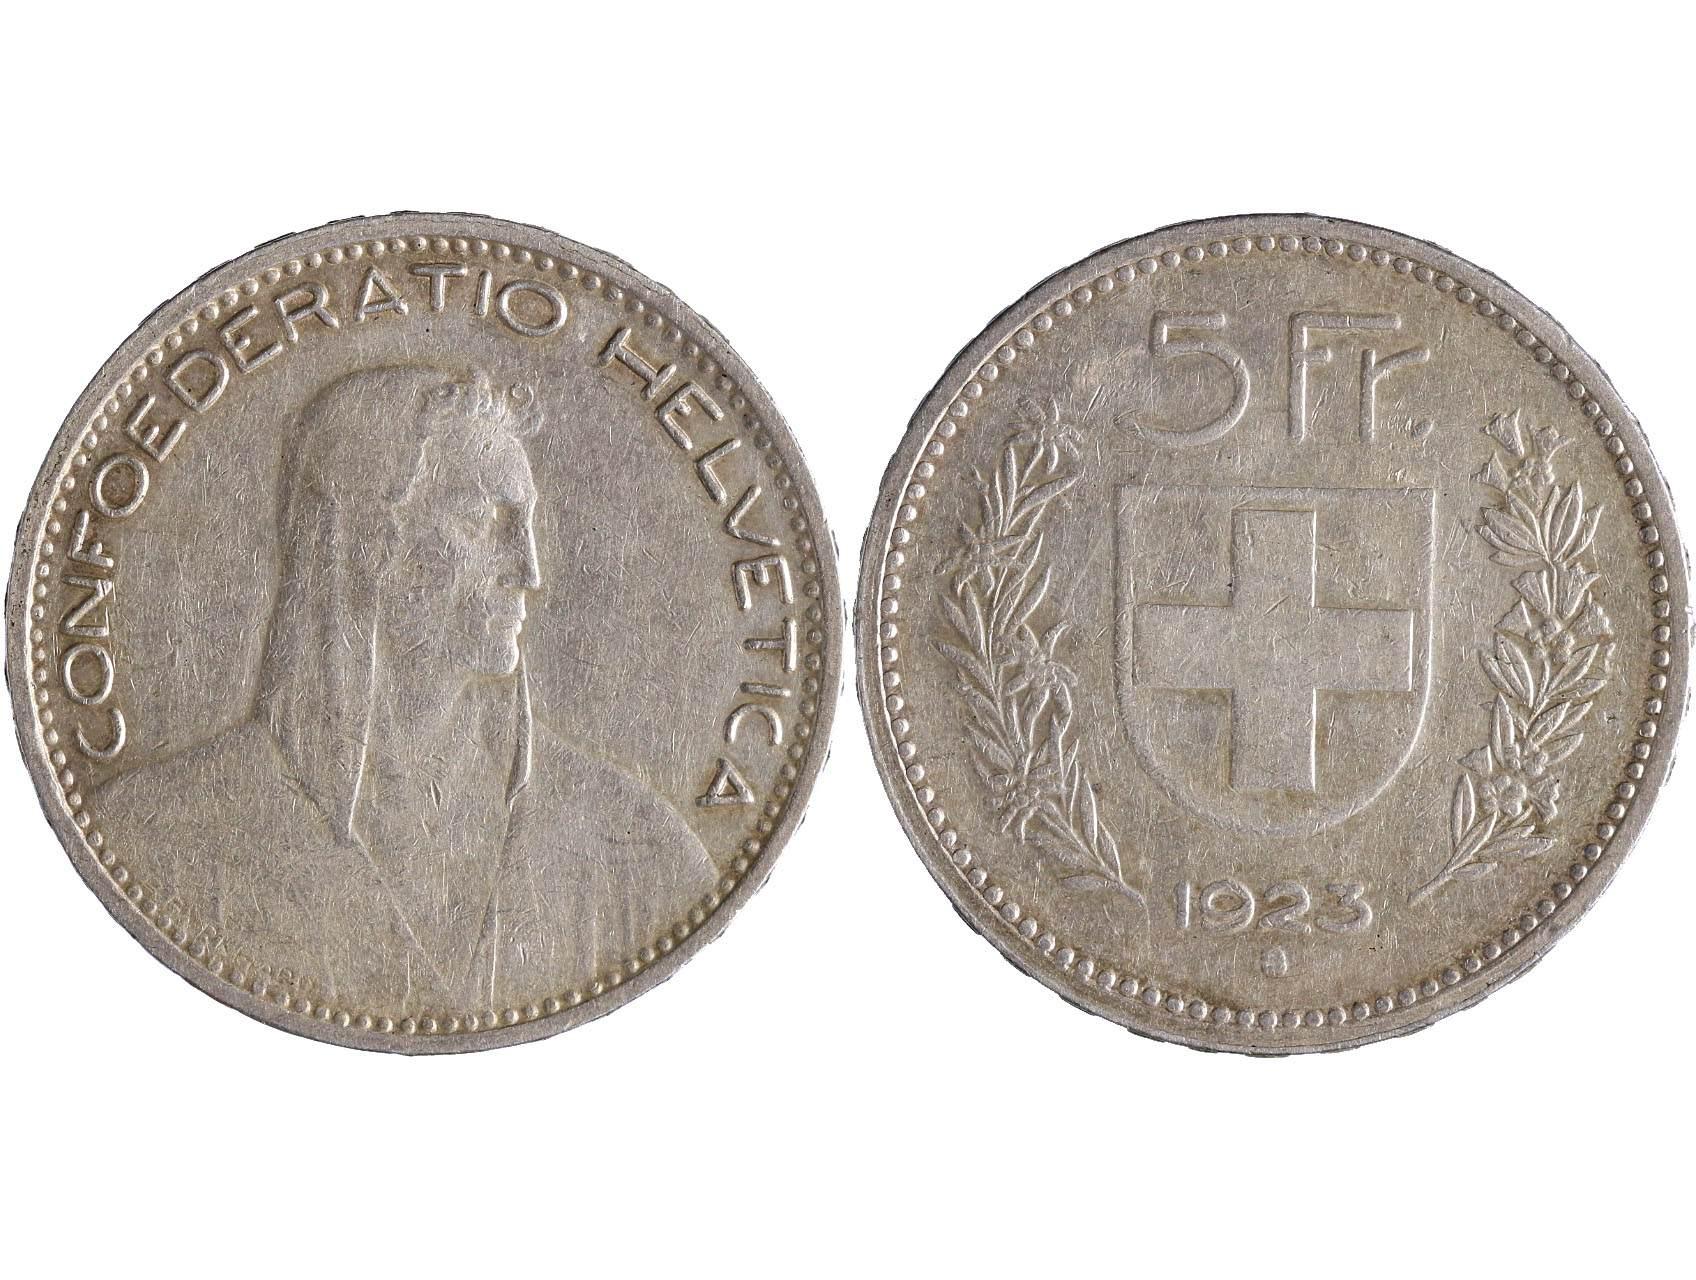 Švýcarsko - 5 Frank 1923 B, KM 37